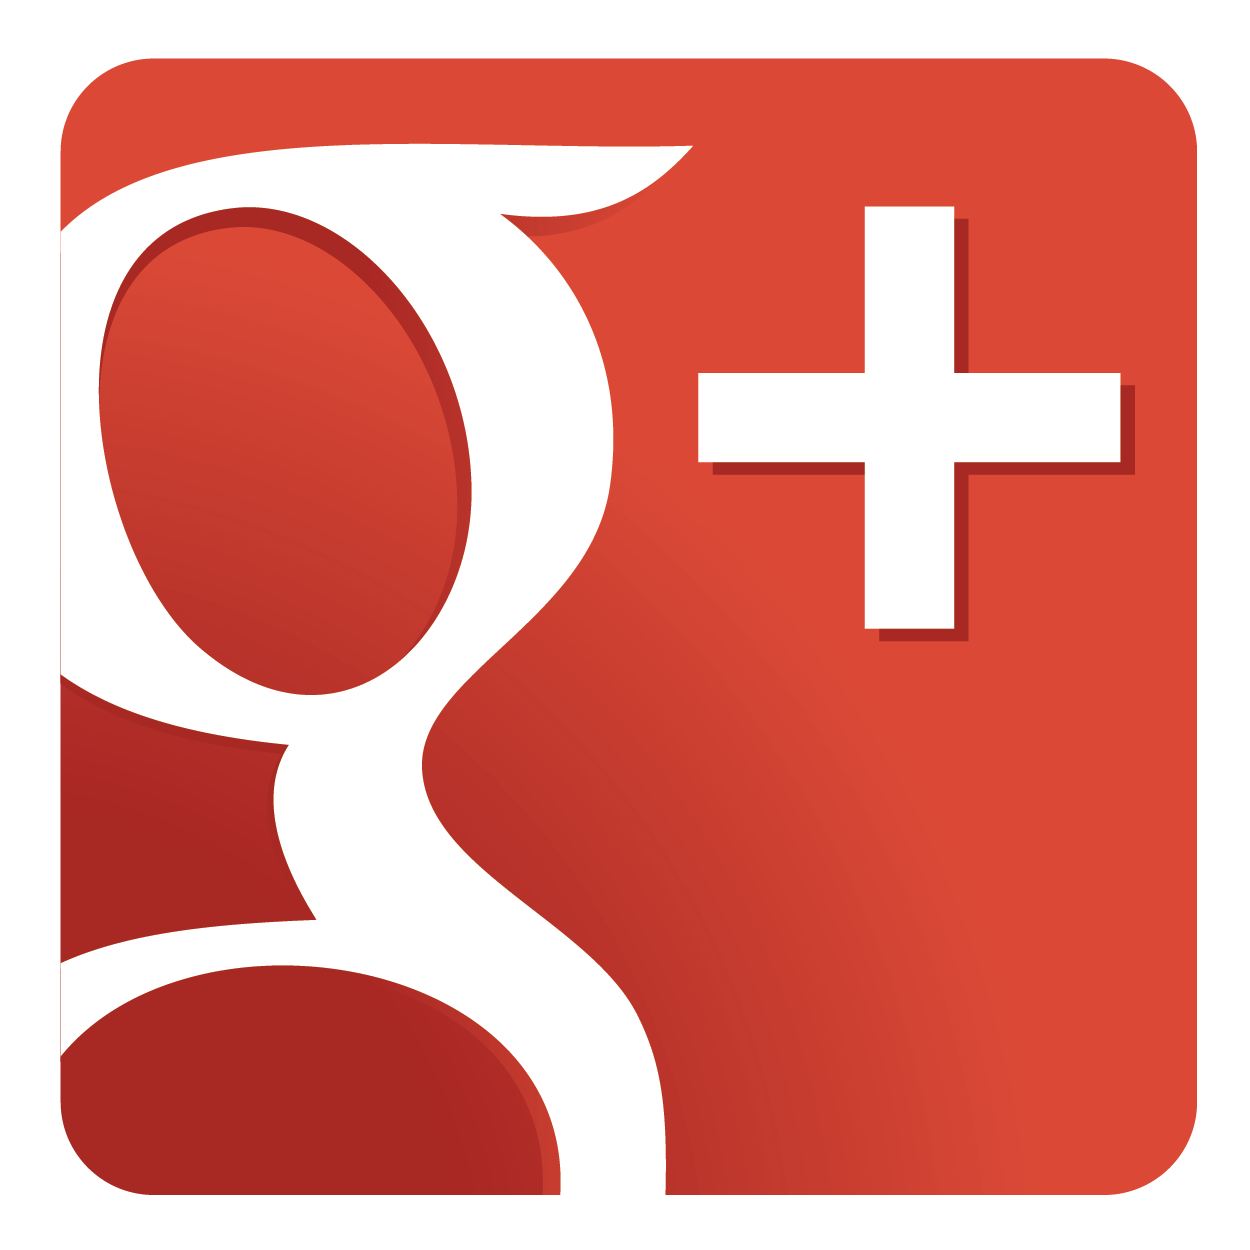 Google+で2017年1月例会『さくら色 オカンの嫁入り』 - 香川市民劇場を共有